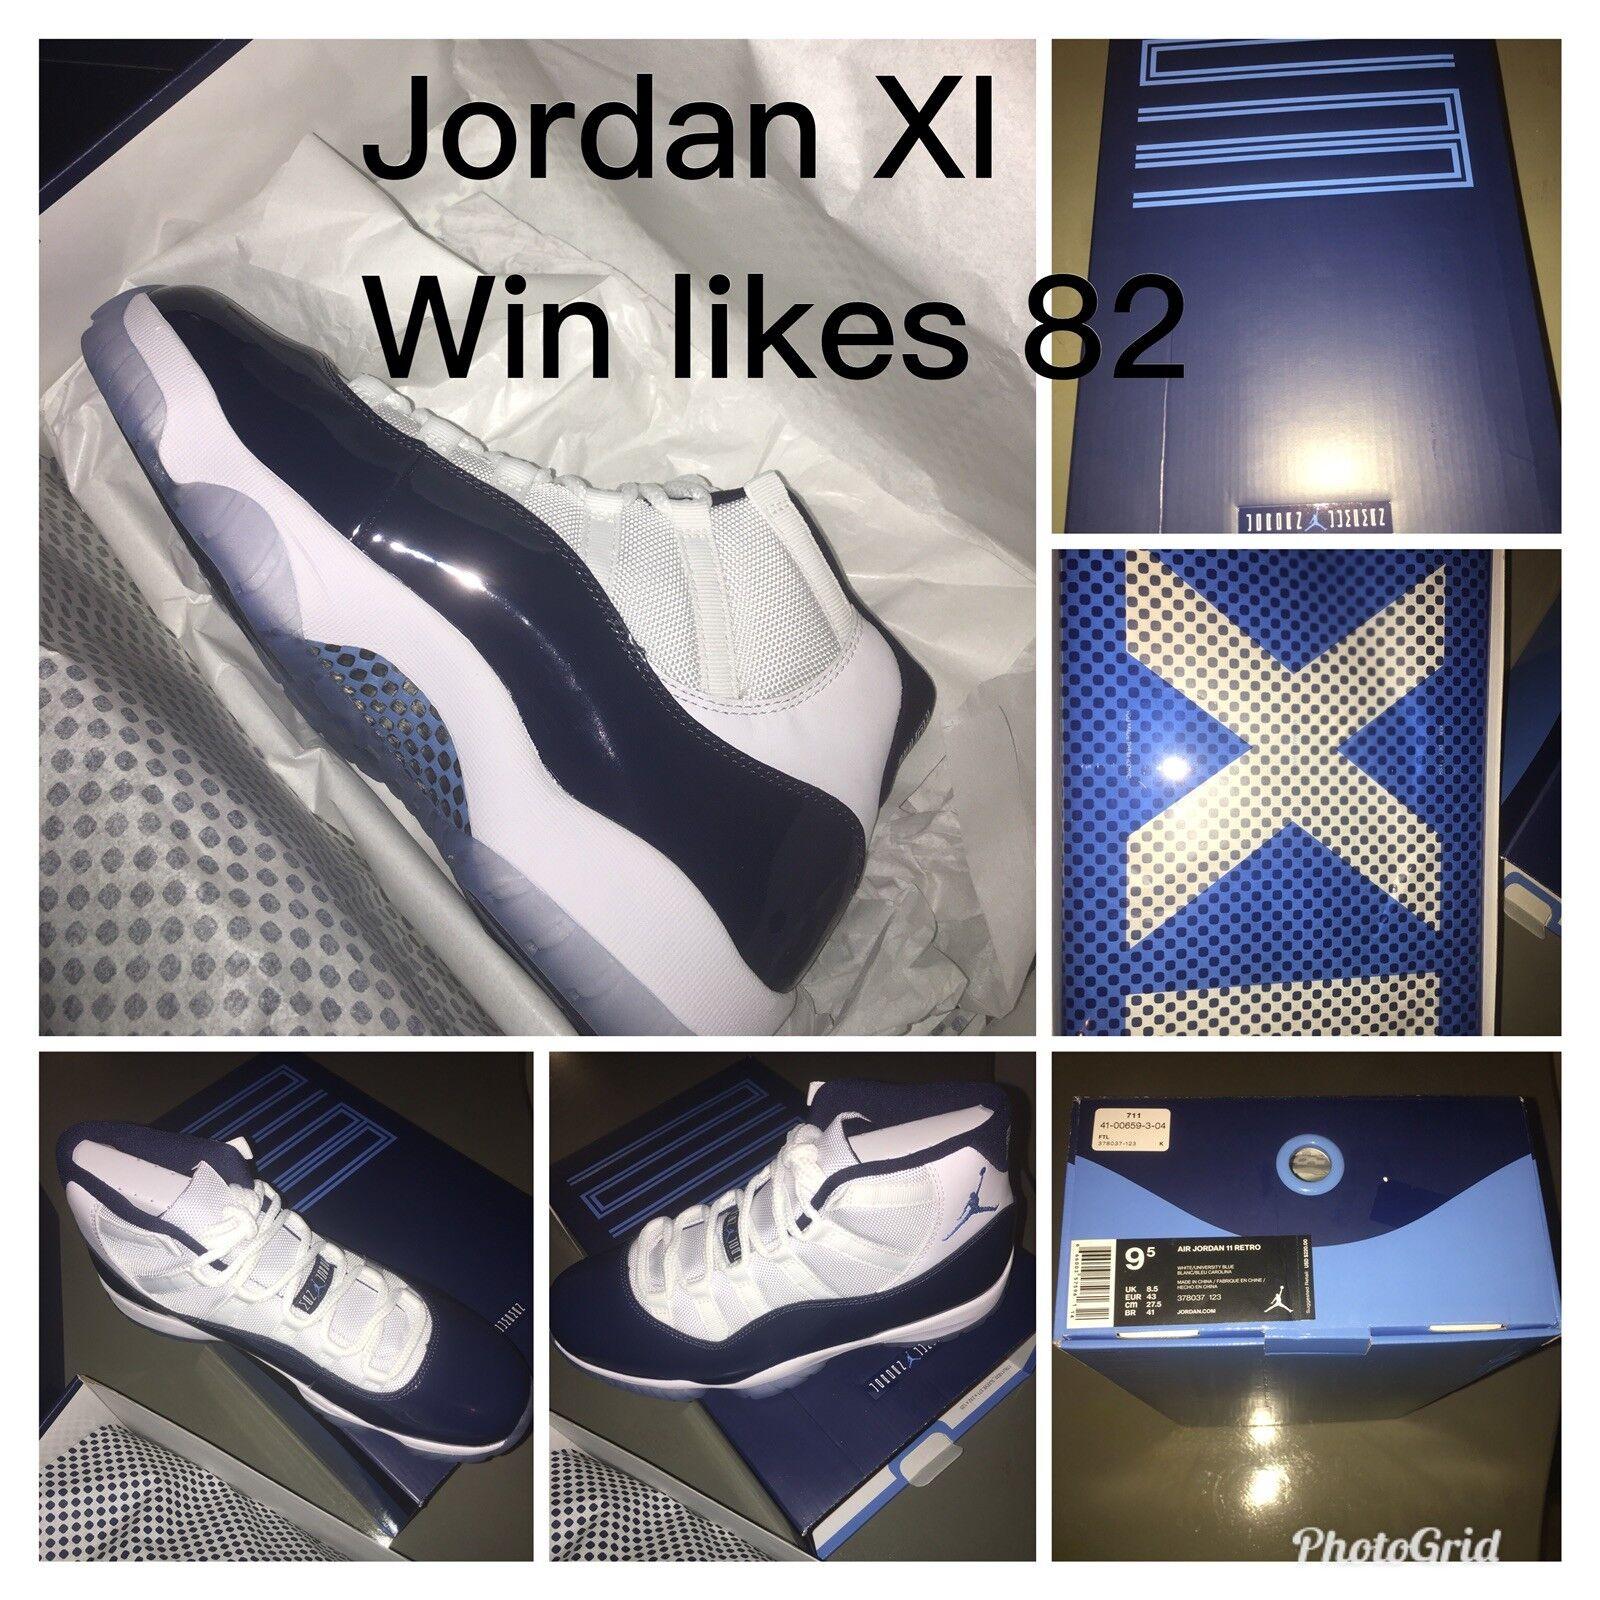 Nike air jordan 11 retro - xi gewinnen wie mitternacht 82 unc aj11 mitternacht wie marine  378037-123 345cce